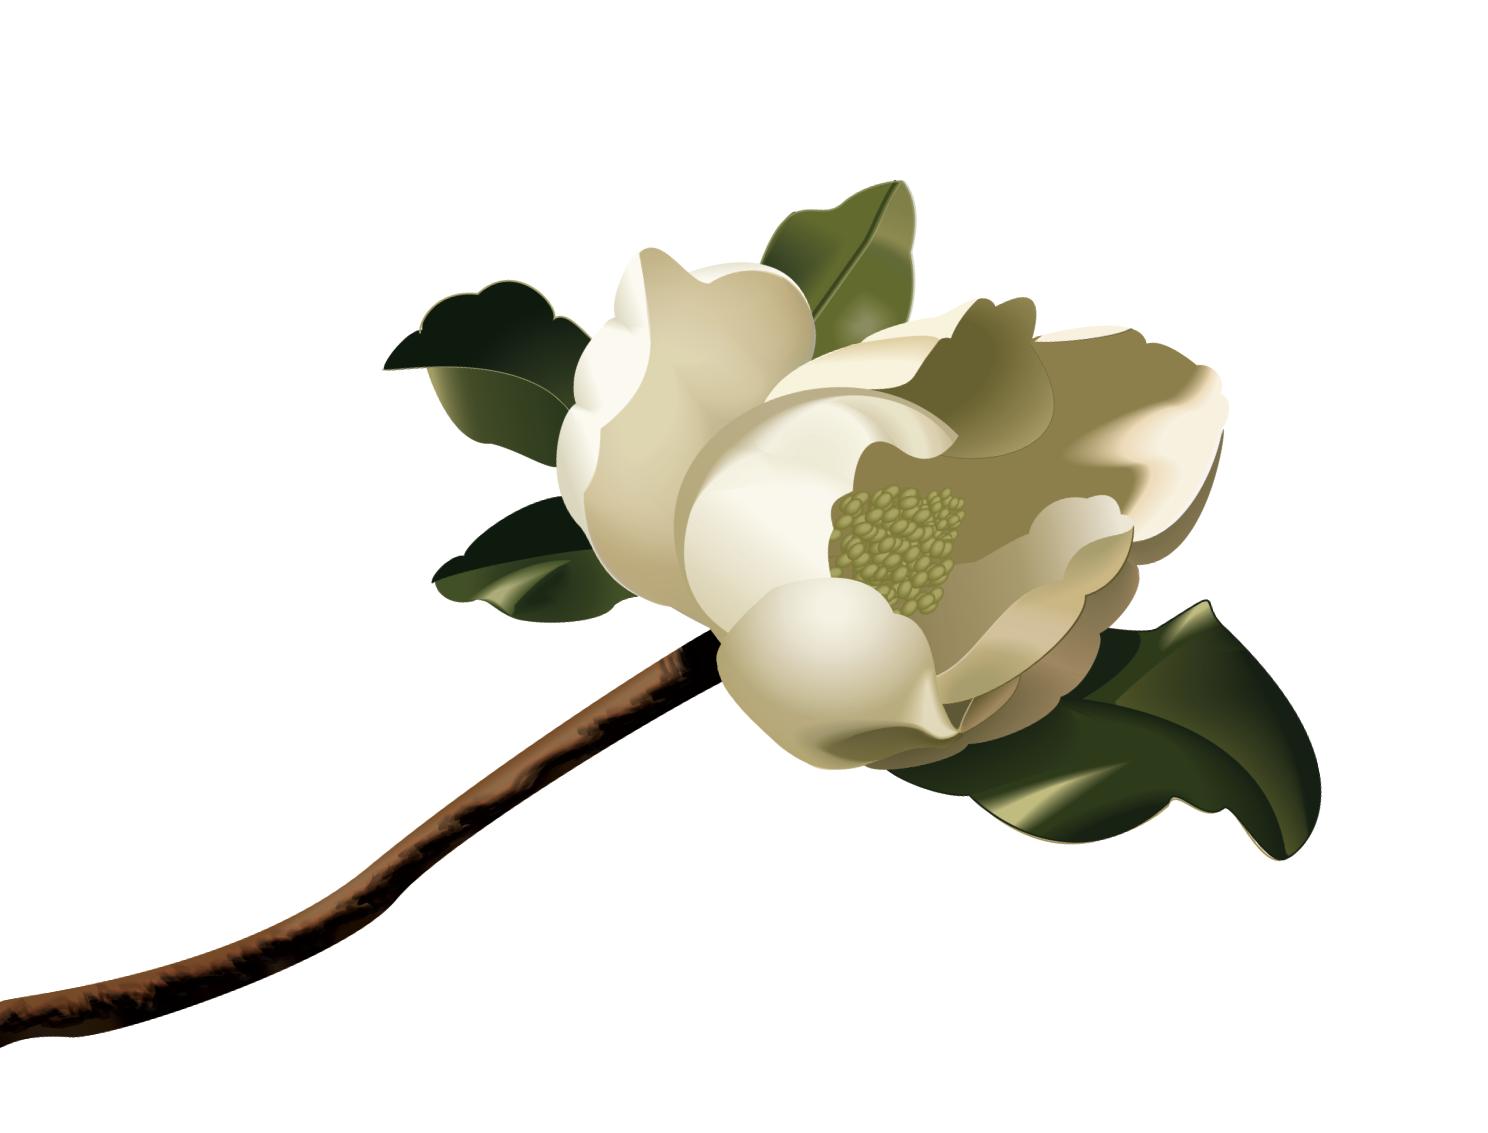 Magnolia Clip Art Clipart Best-Magnolia Clip Art Clipart Best-3